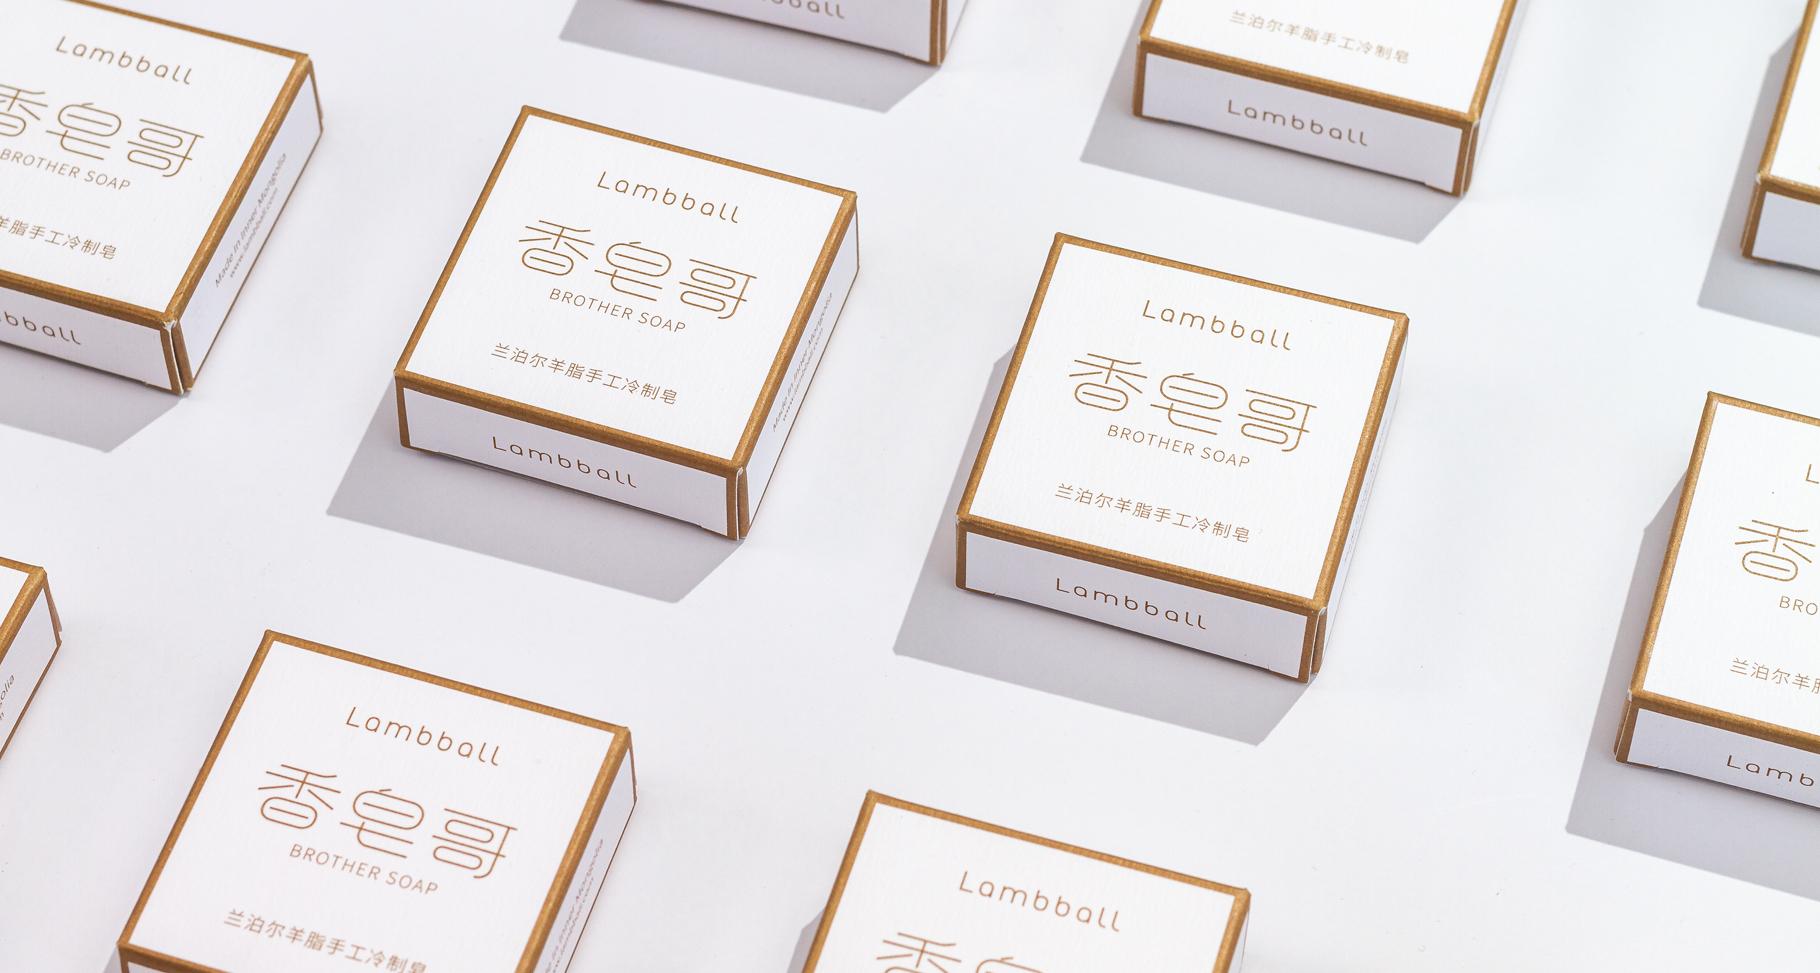 lambball品牌系列产品包装设计 第4张